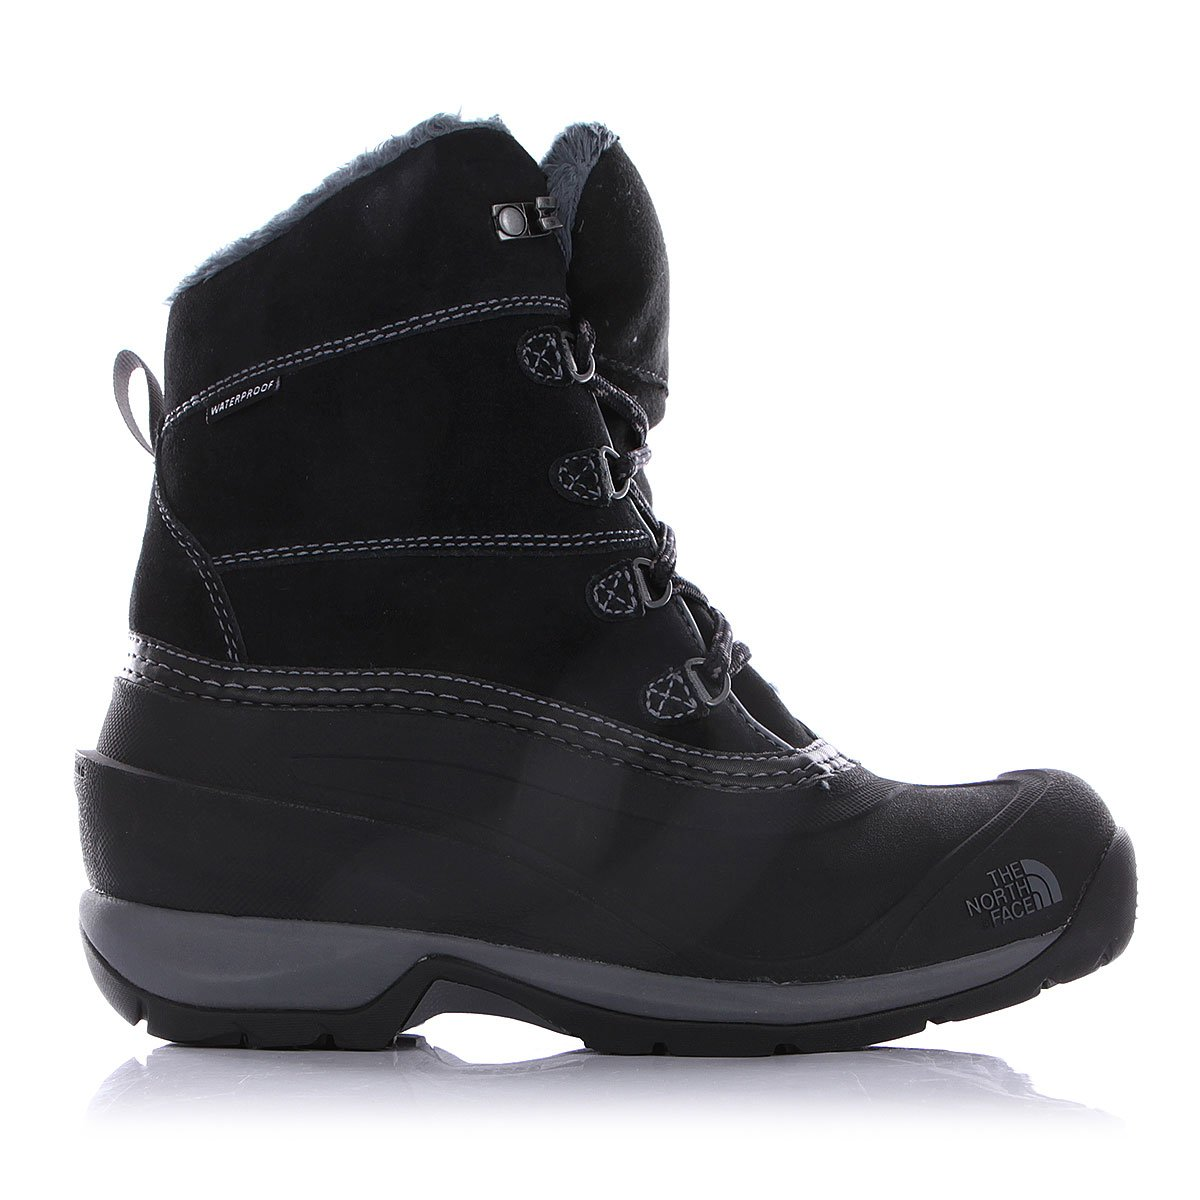 Зимние ботинки north face цена